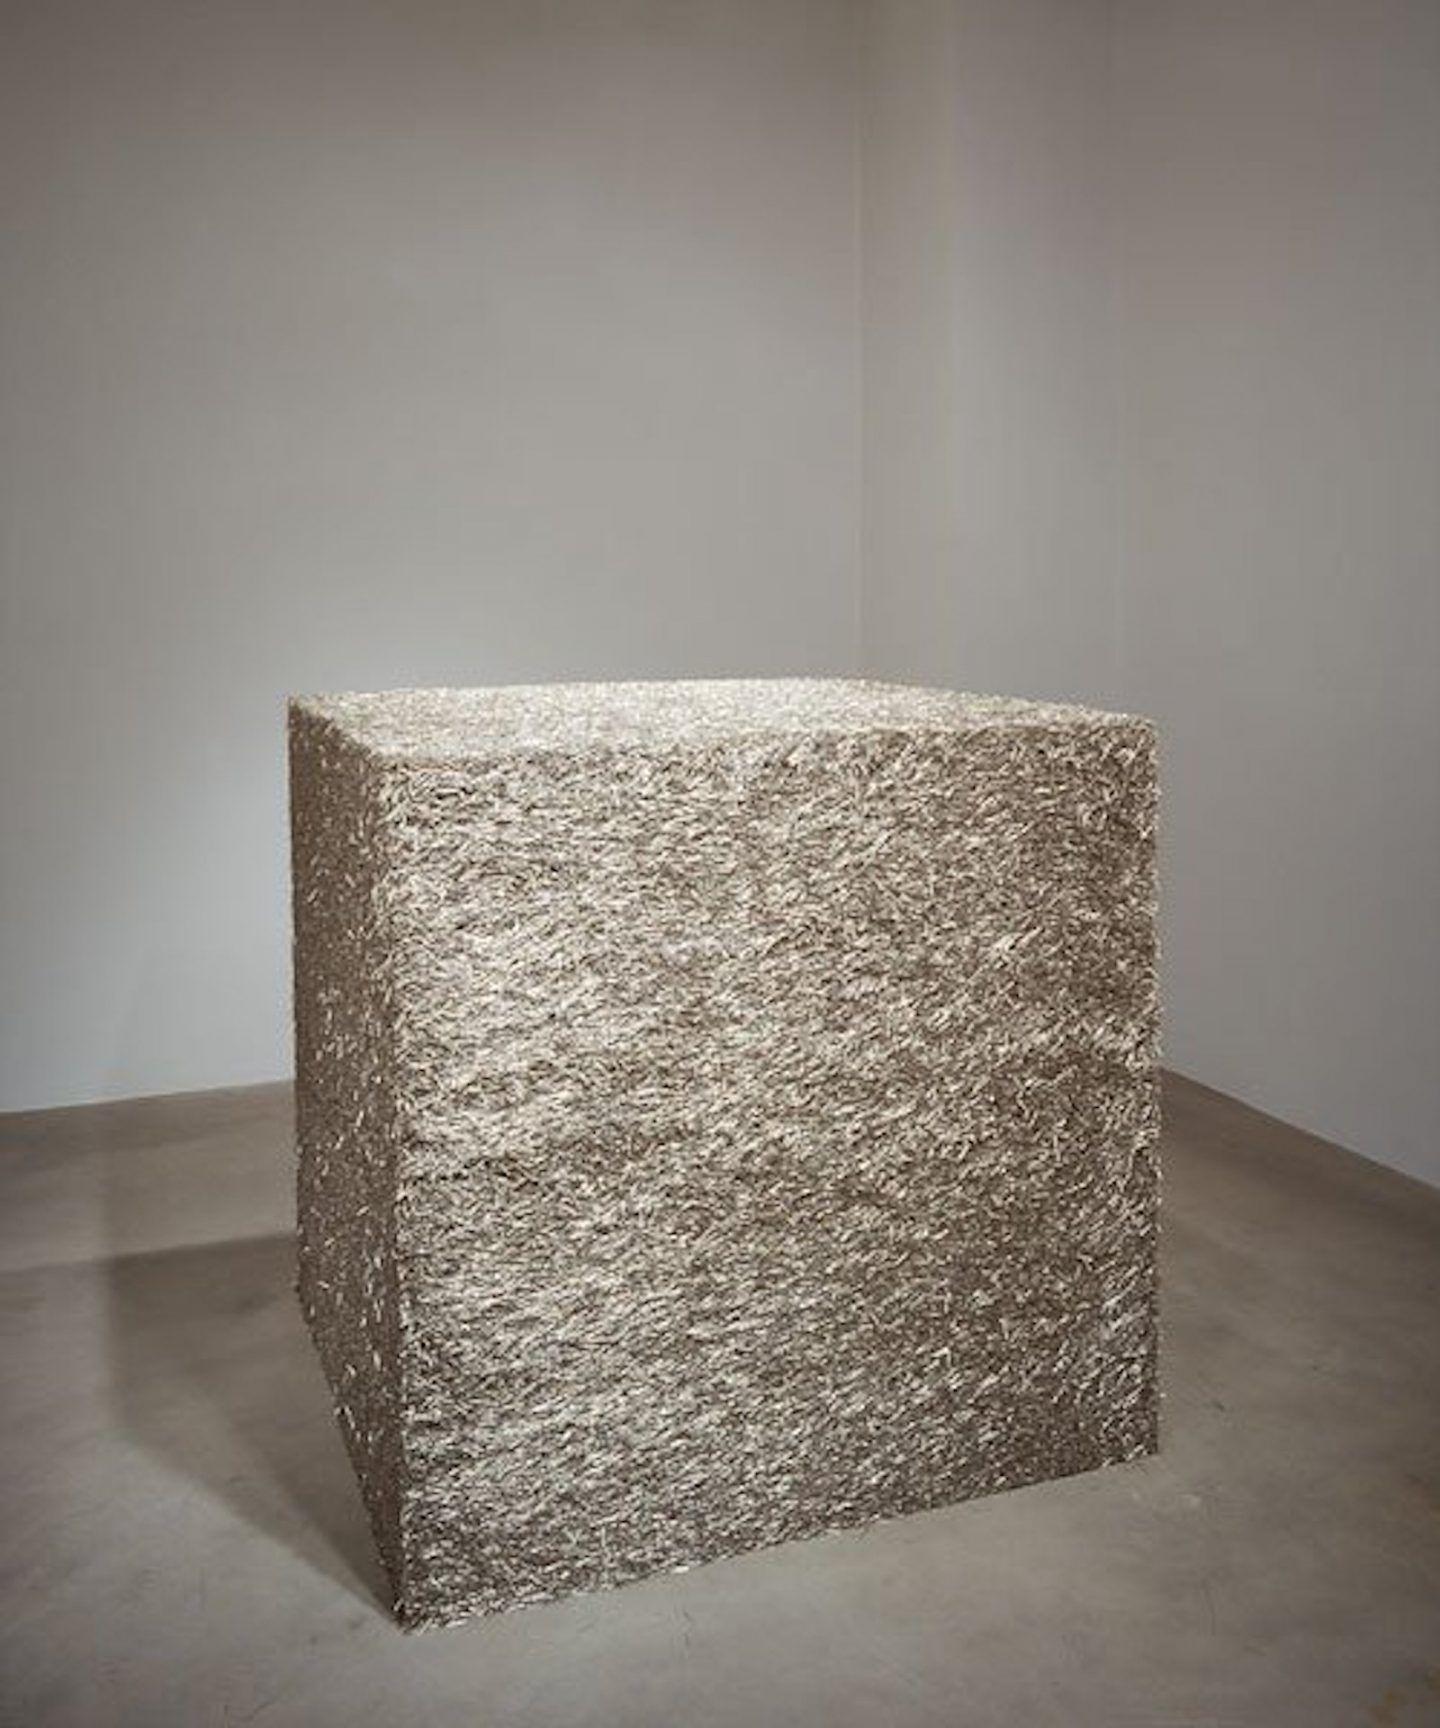 IGNANT-Art-Tara-Donovan-02